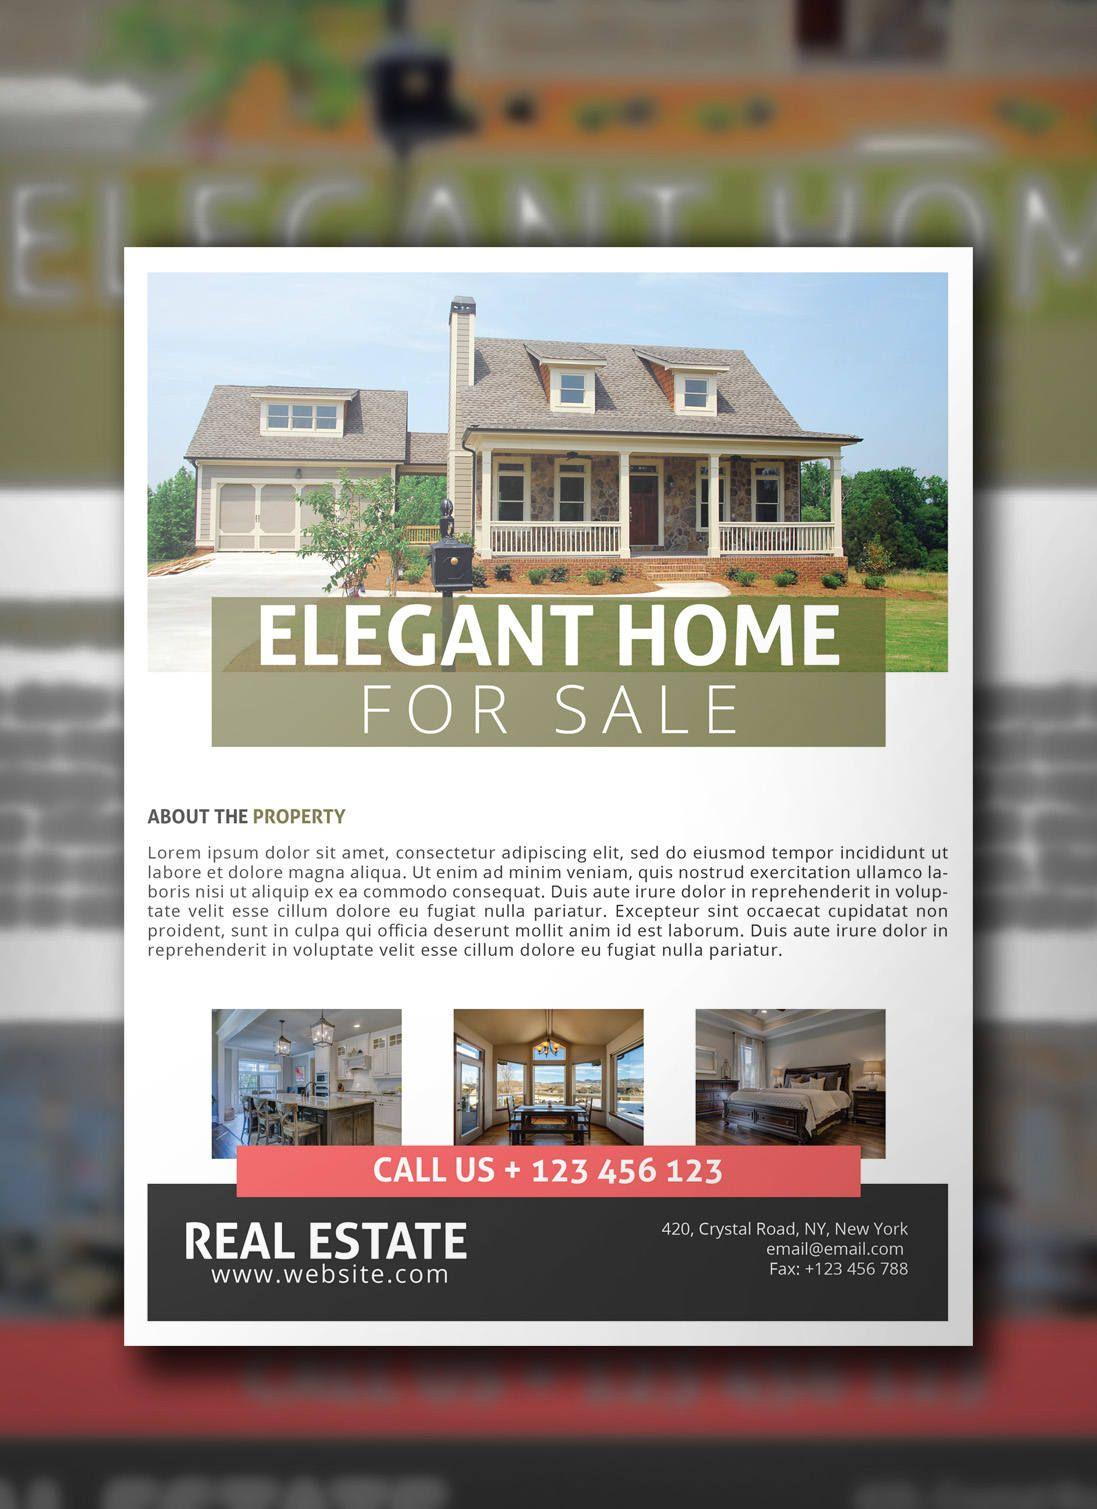 Real Estate Flyer Psd Template Marketing Flyer Real Estate Flyer Realty Instant Download Photoshop Template By B Real Estate Flyers Flyer Marketing Flyers Real estate flyer template psd